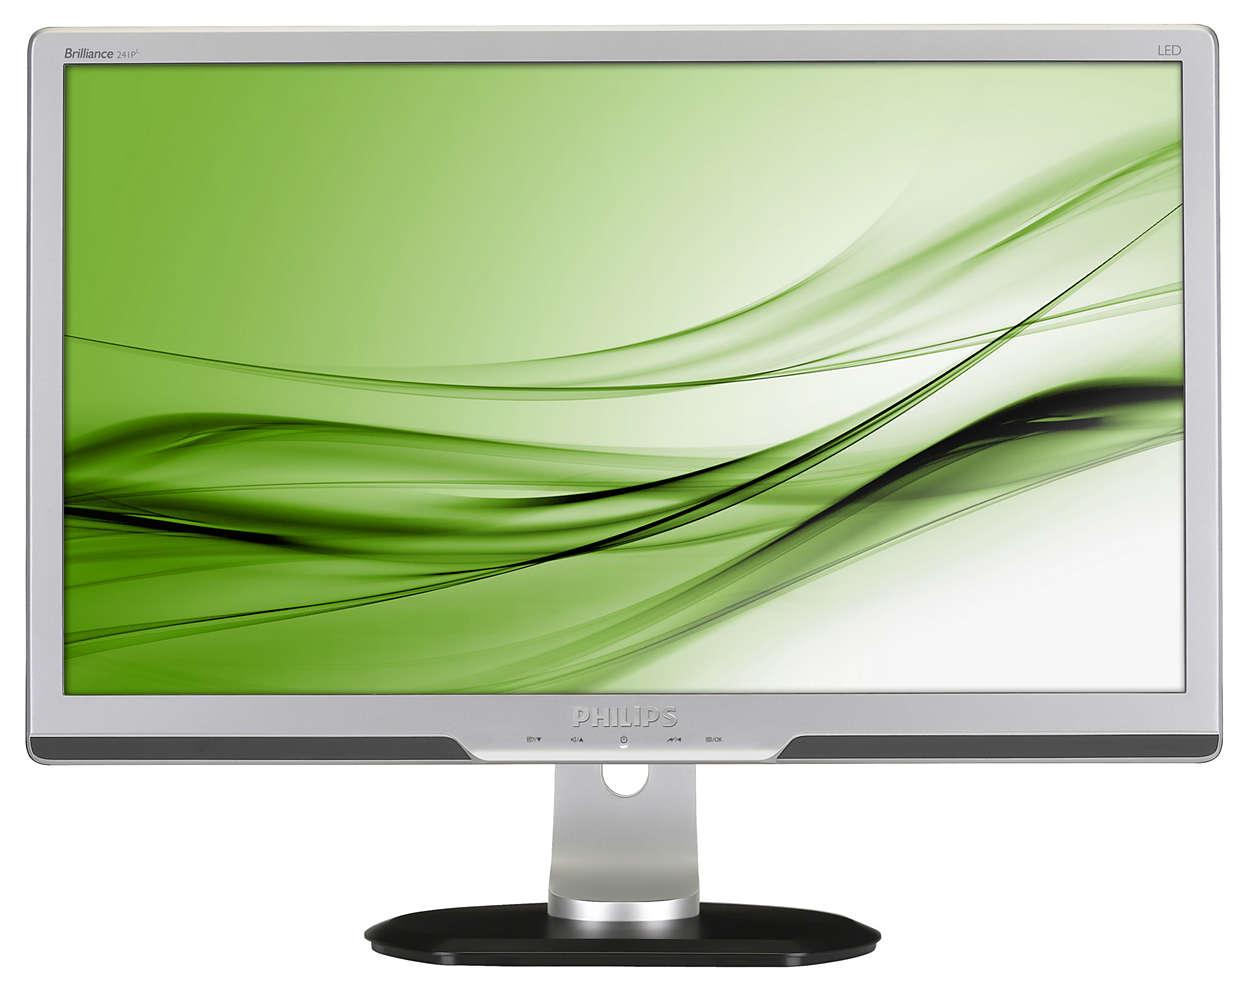 Profesionální ergonomický displej zvyšuje produktivitu